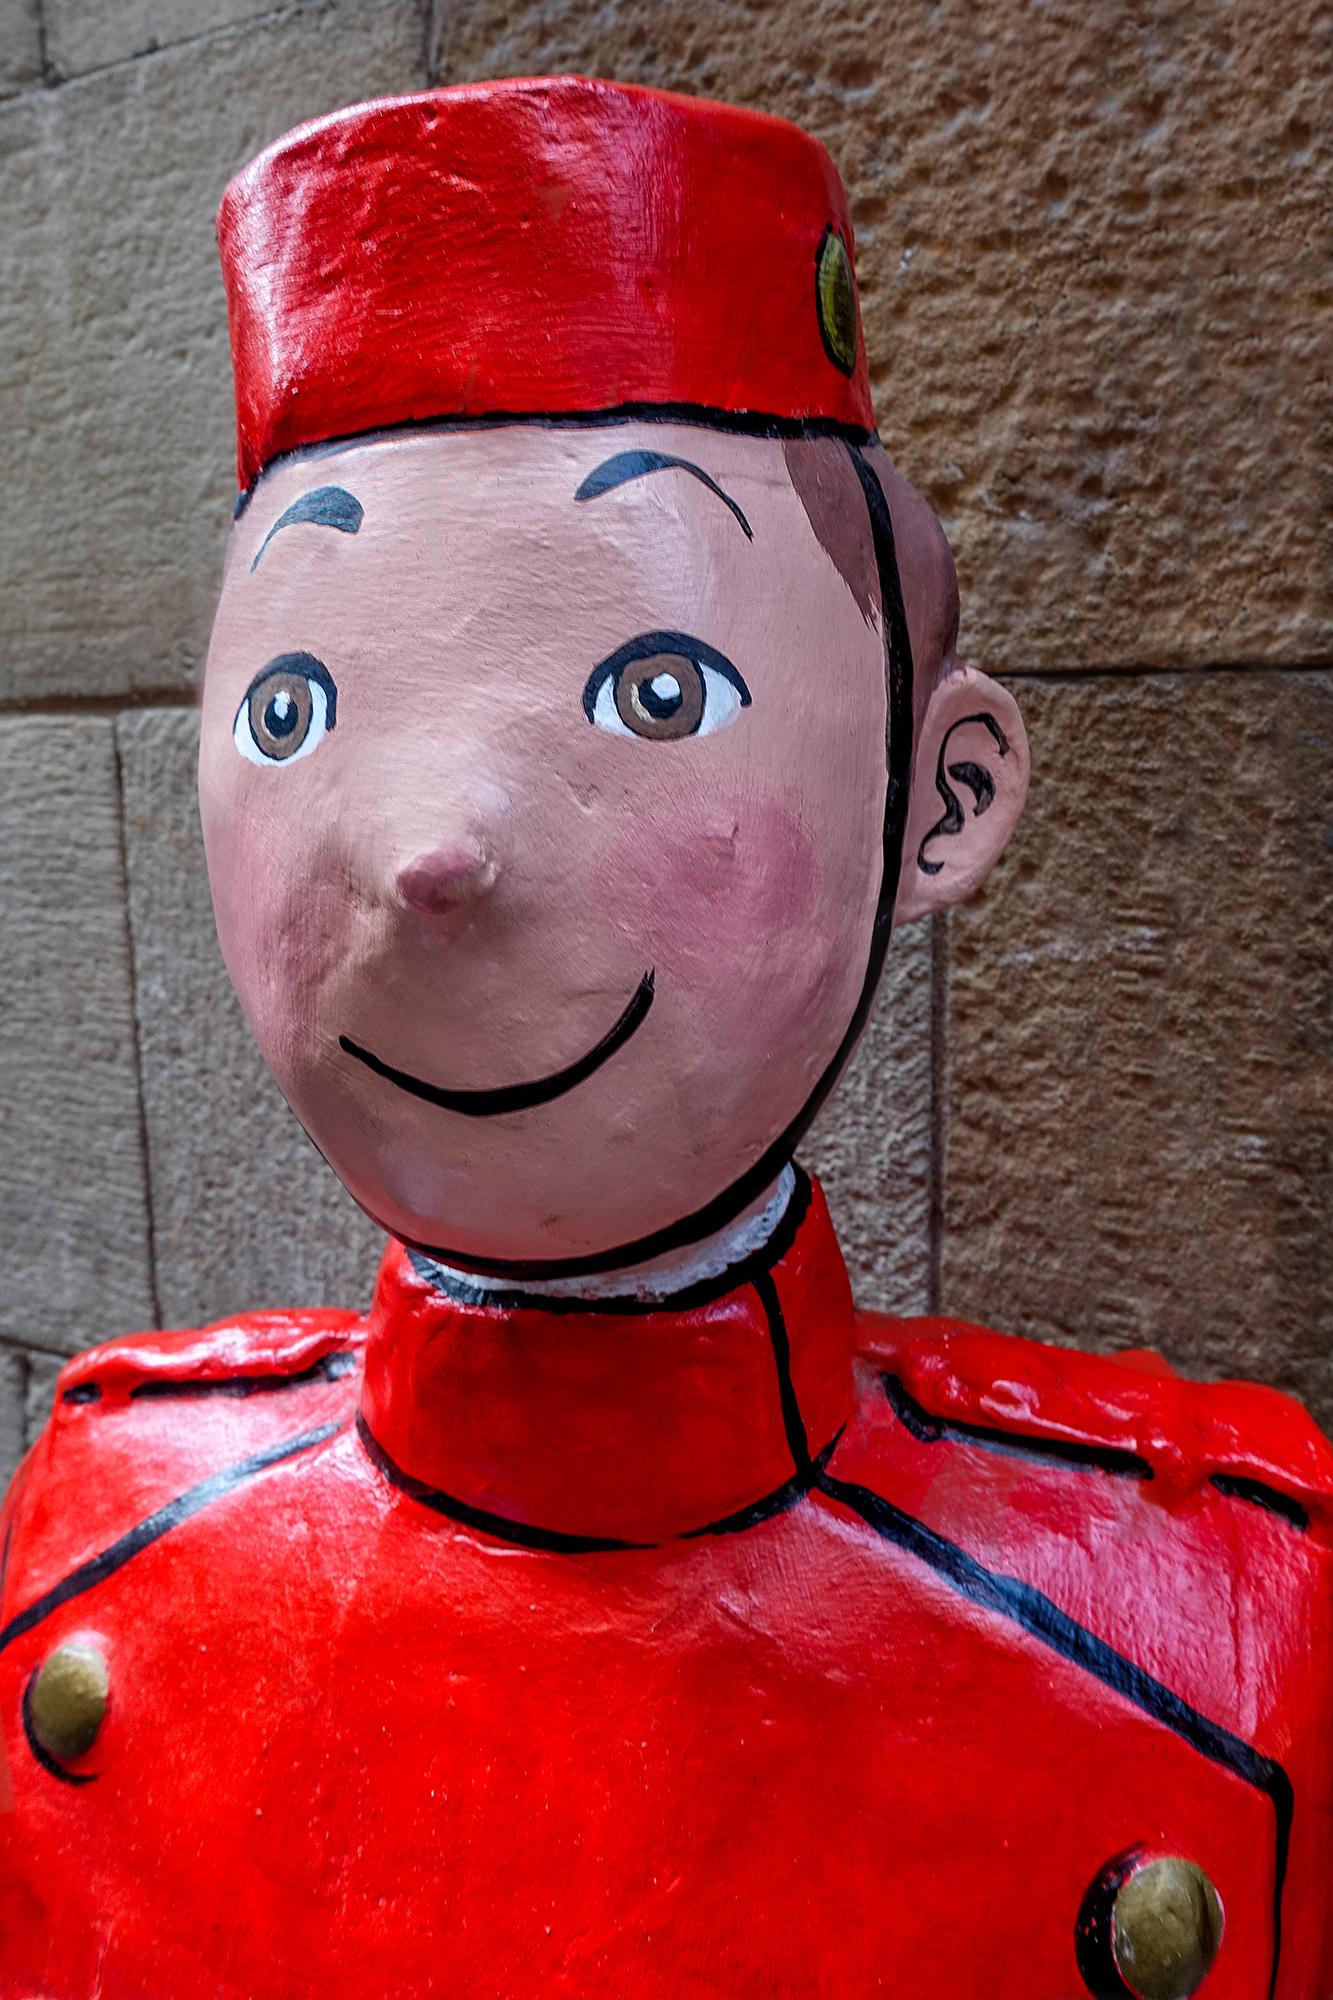 Tin Tin in Red. Barcelona, 2015